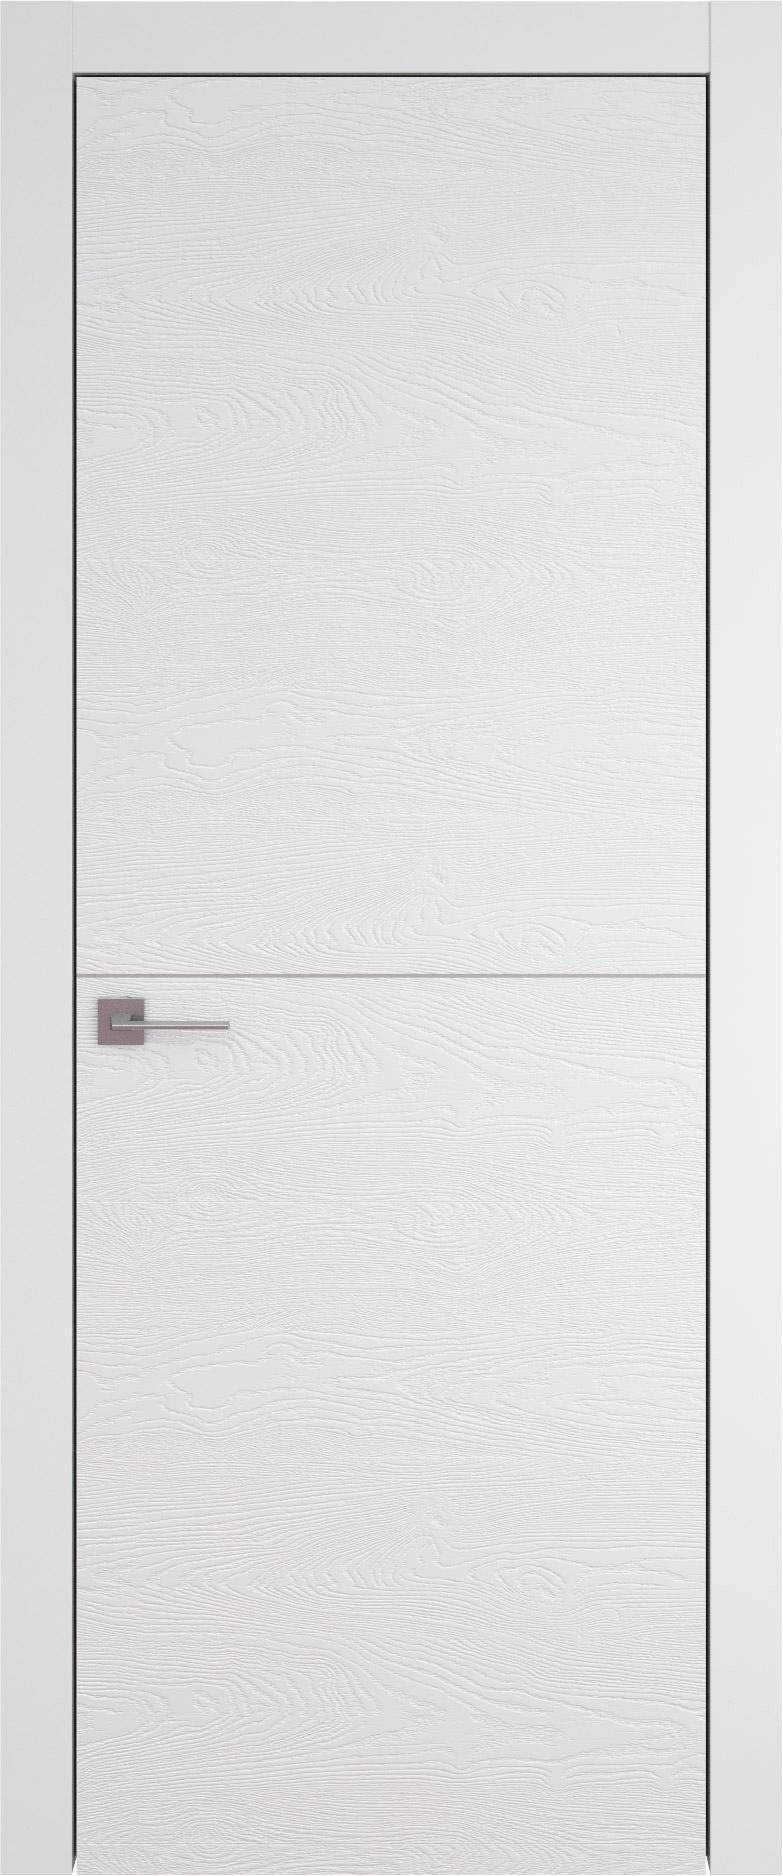 Tivoli Б-2 цвет - Белая эмаль по шпону (RAL 9003) Без стекла (ДГ)